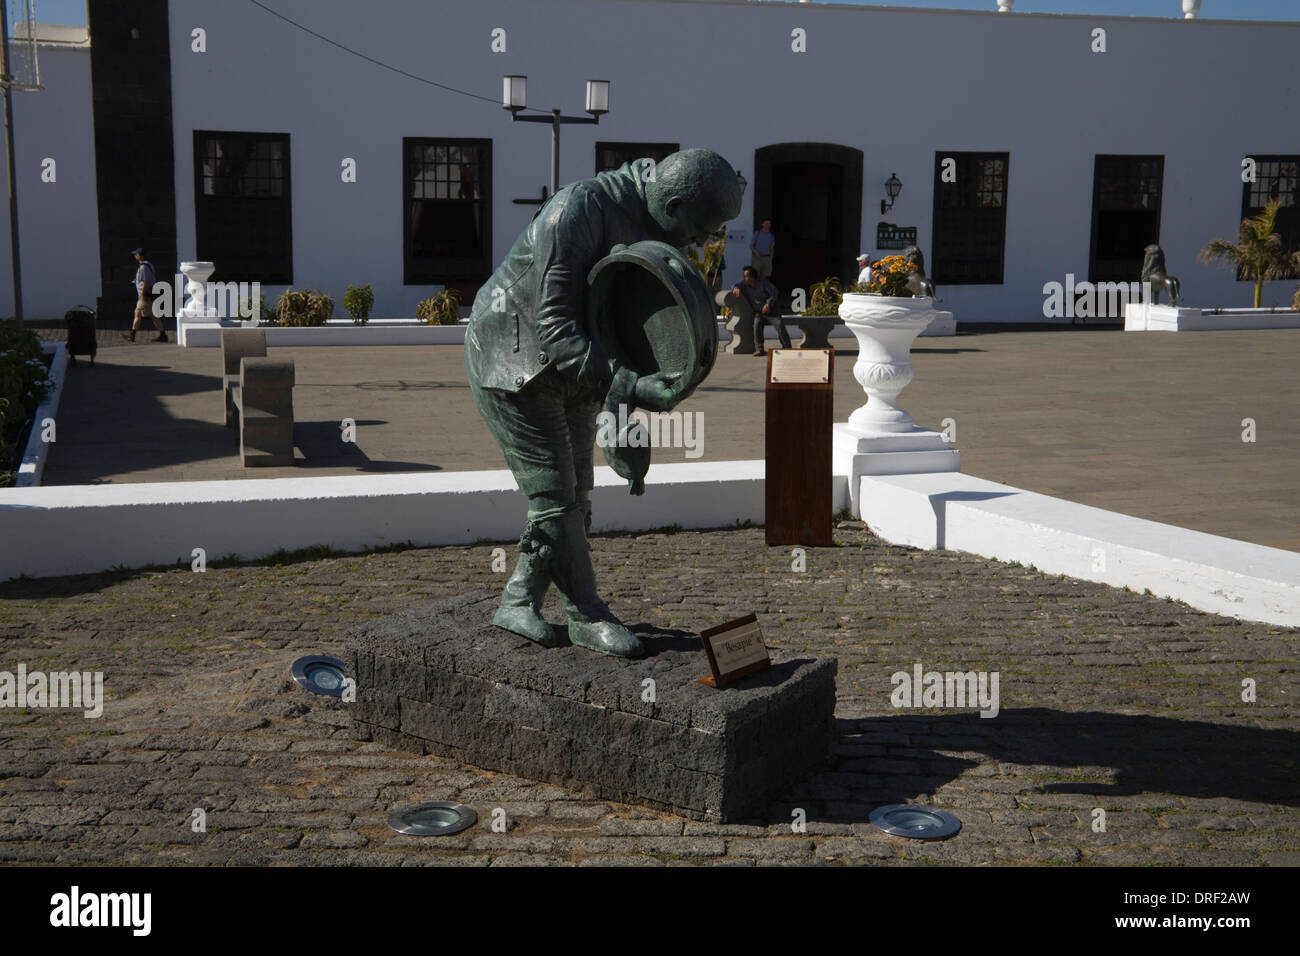 Teguise Lanzarote Besapie Wundertätigkeit von Rigoberto Perez Camacho in Plaza De La Constitucion Casa Museo del Timple hinter Stockbild